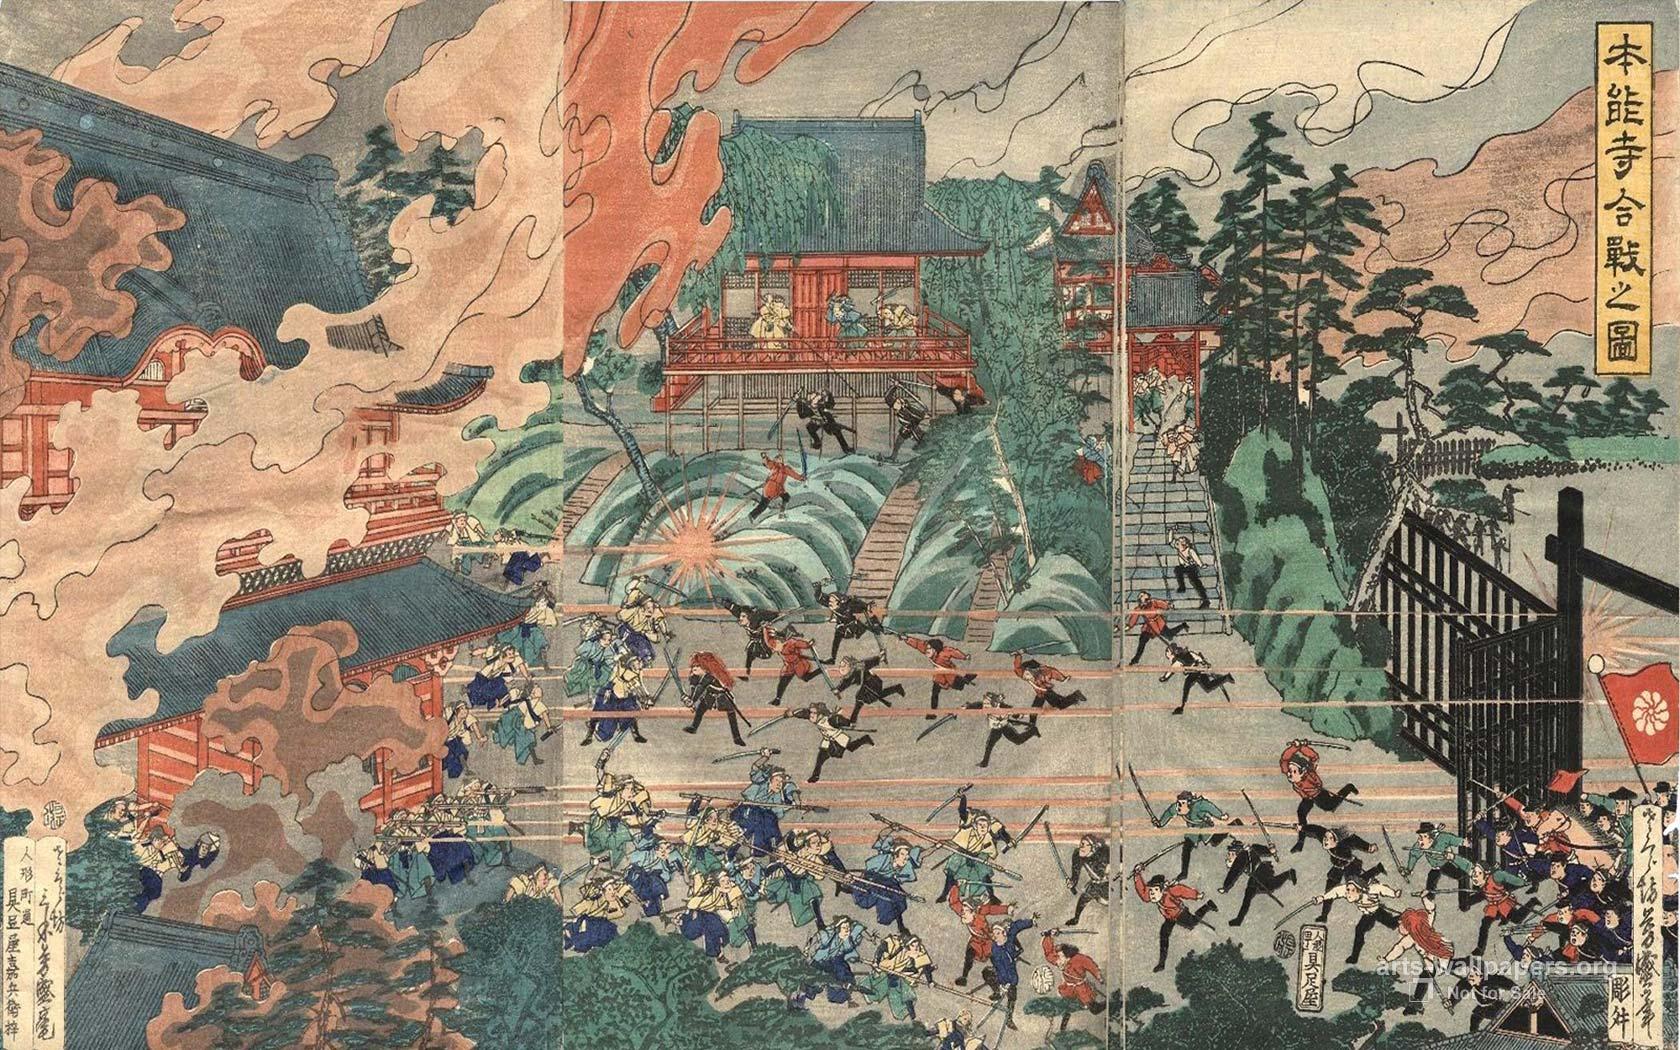 Japanese Art Imperial Paintings Wallpaper Wallpapers Paintings 1680x1050